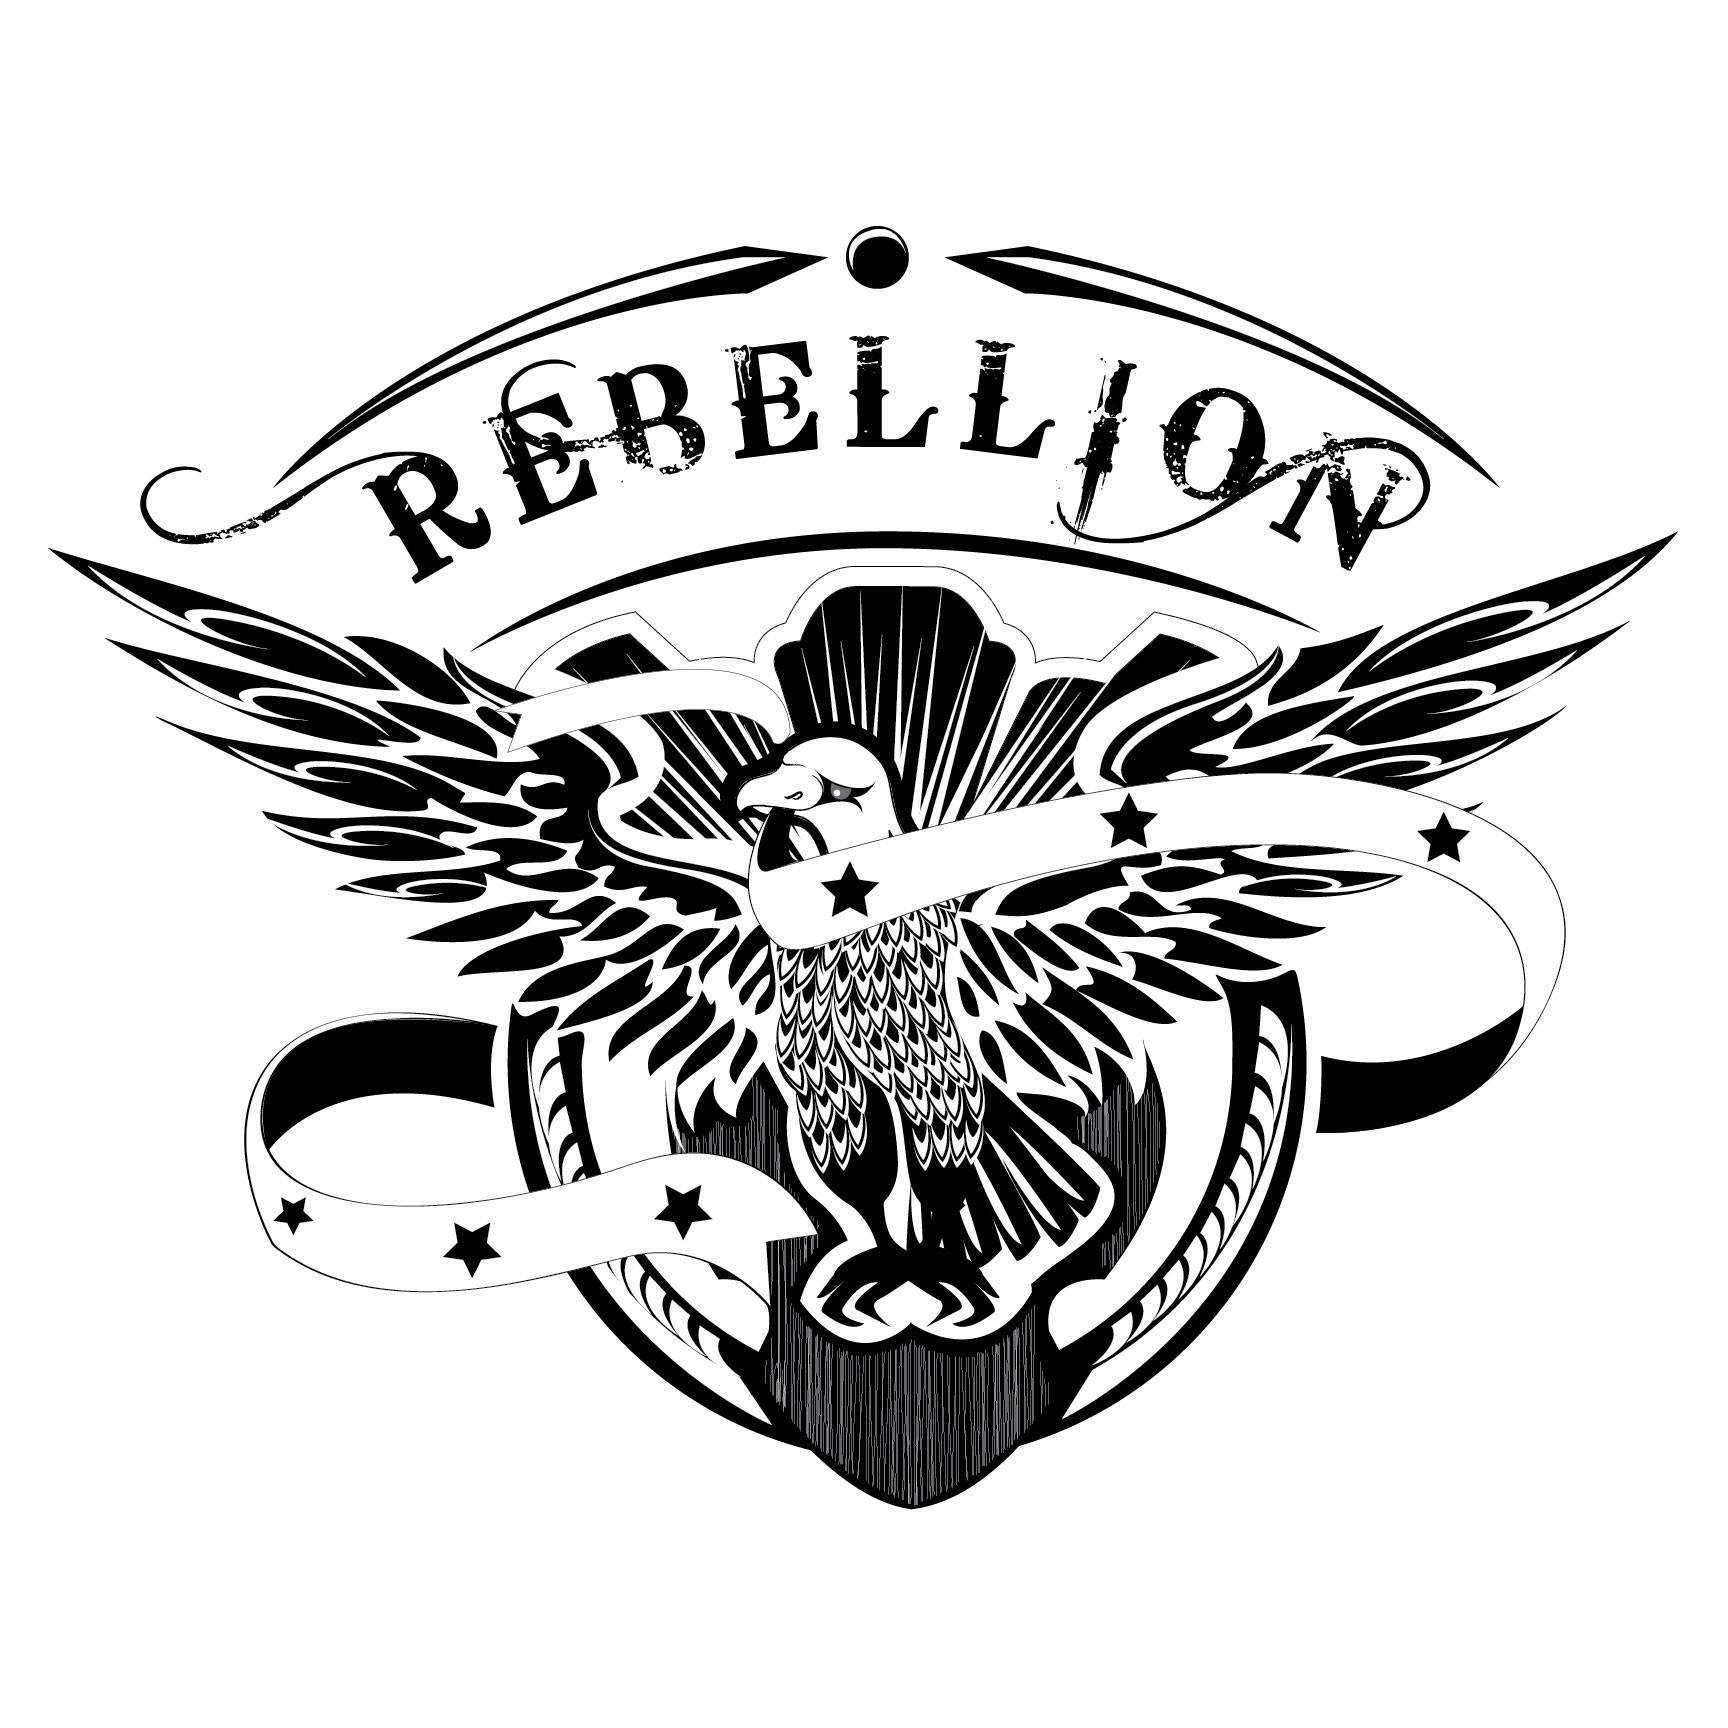 REBELLION NC - Wilmington, NC 28401 - (910)399-1162 | ShowMeLocal.com